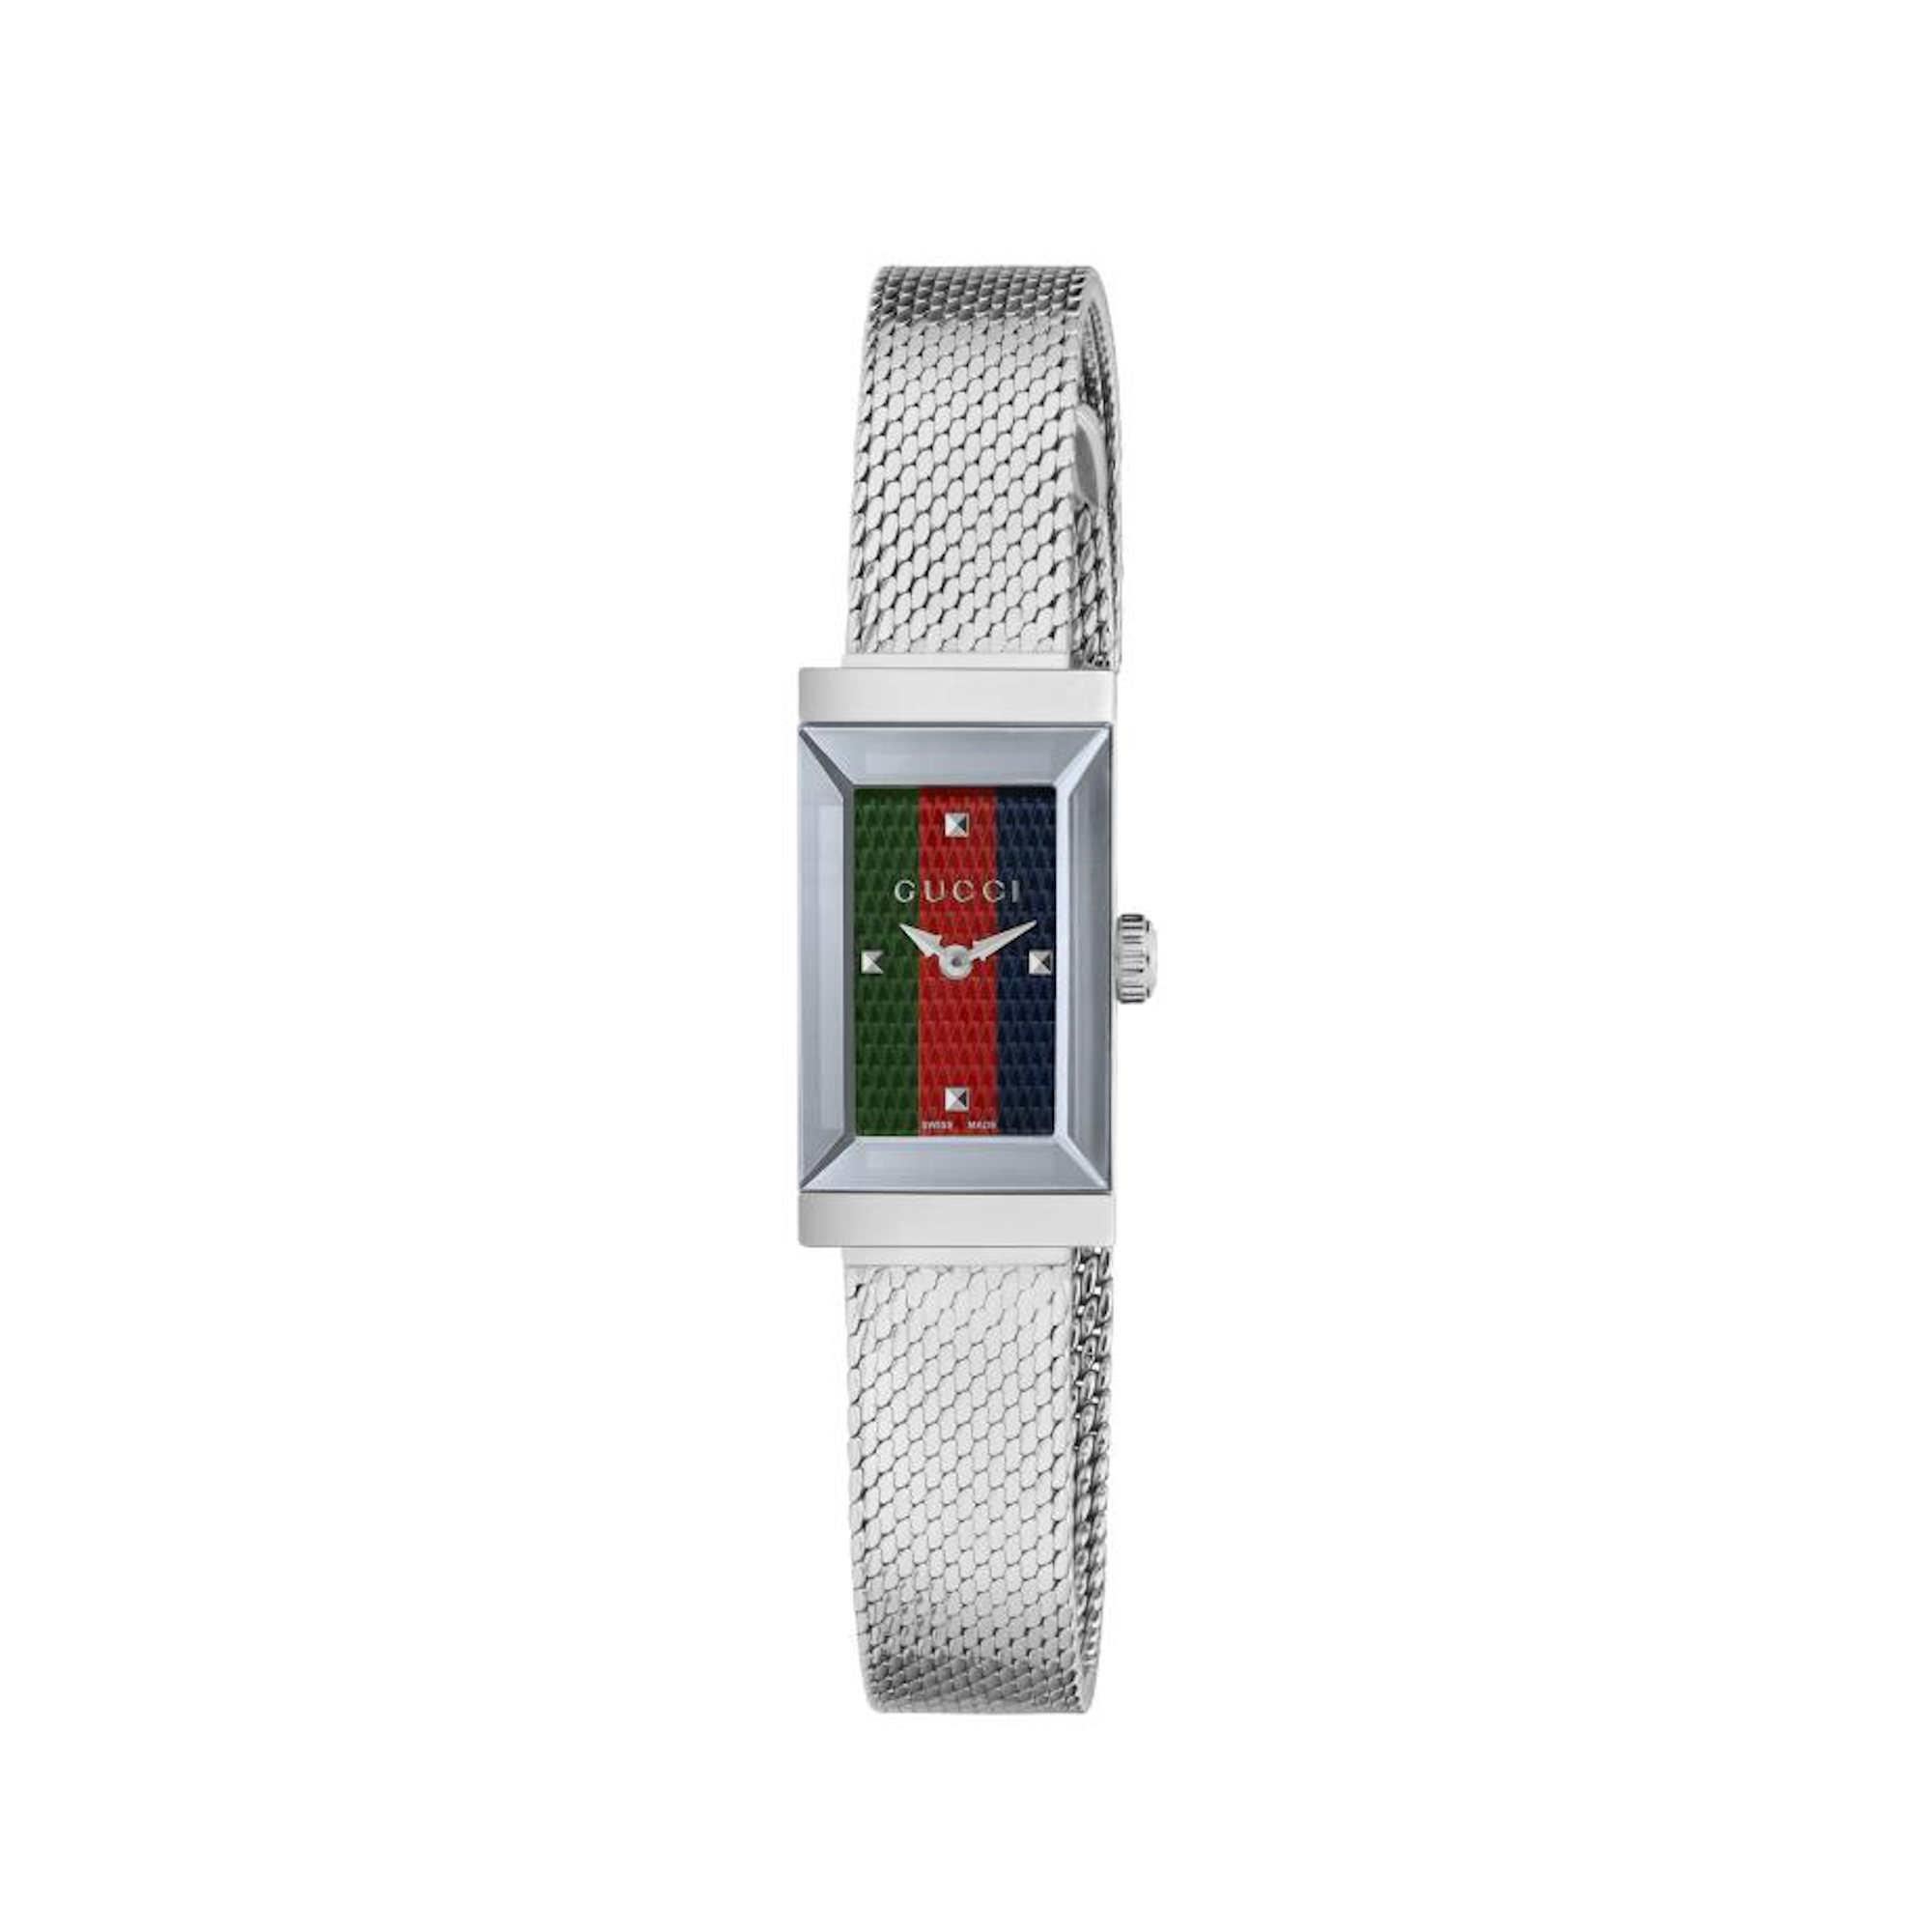 Orologio Gucci G-FRAME 14 X 25 MM ACCIAIO watch steel